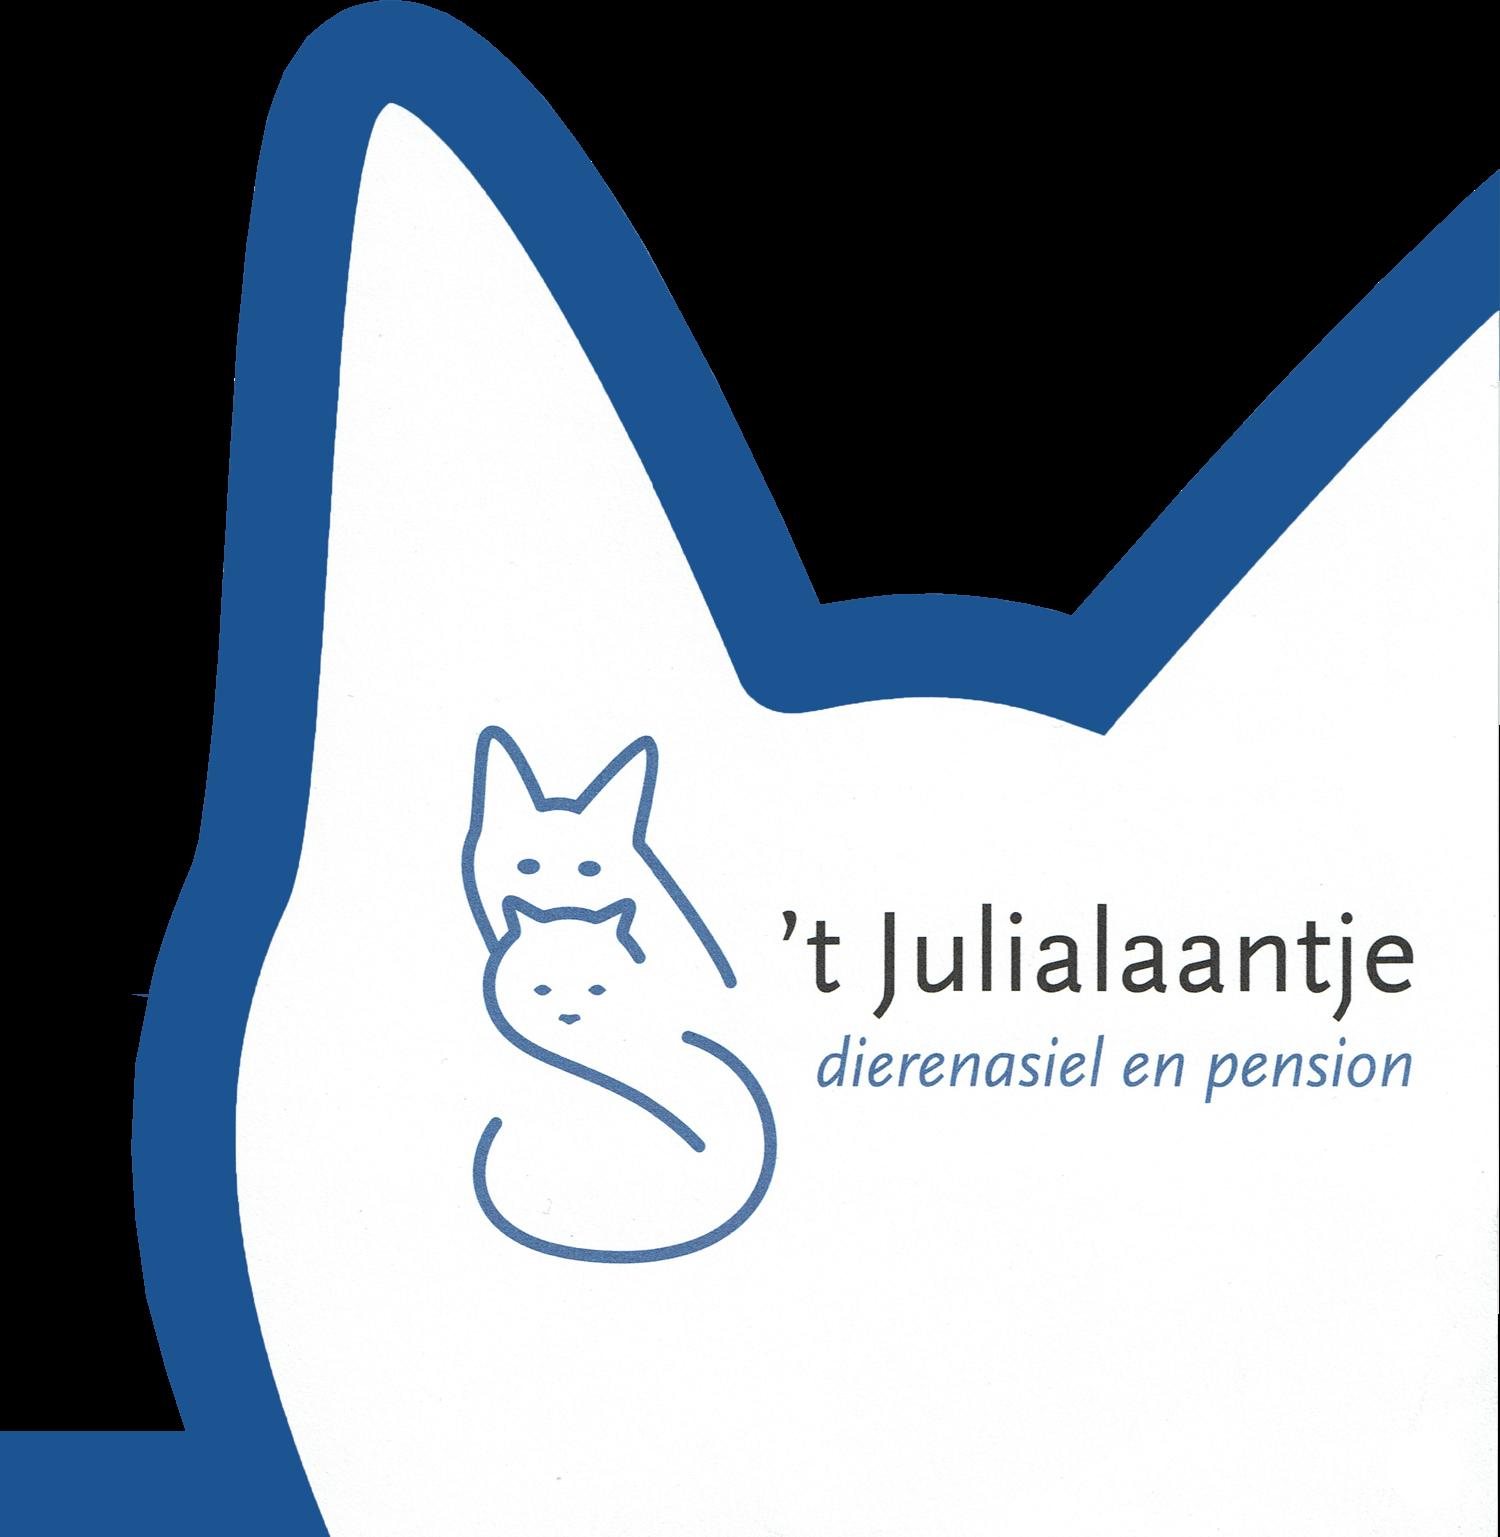 STICHTING STREEKDIERENTEHUIS – T JULIALAANTJE